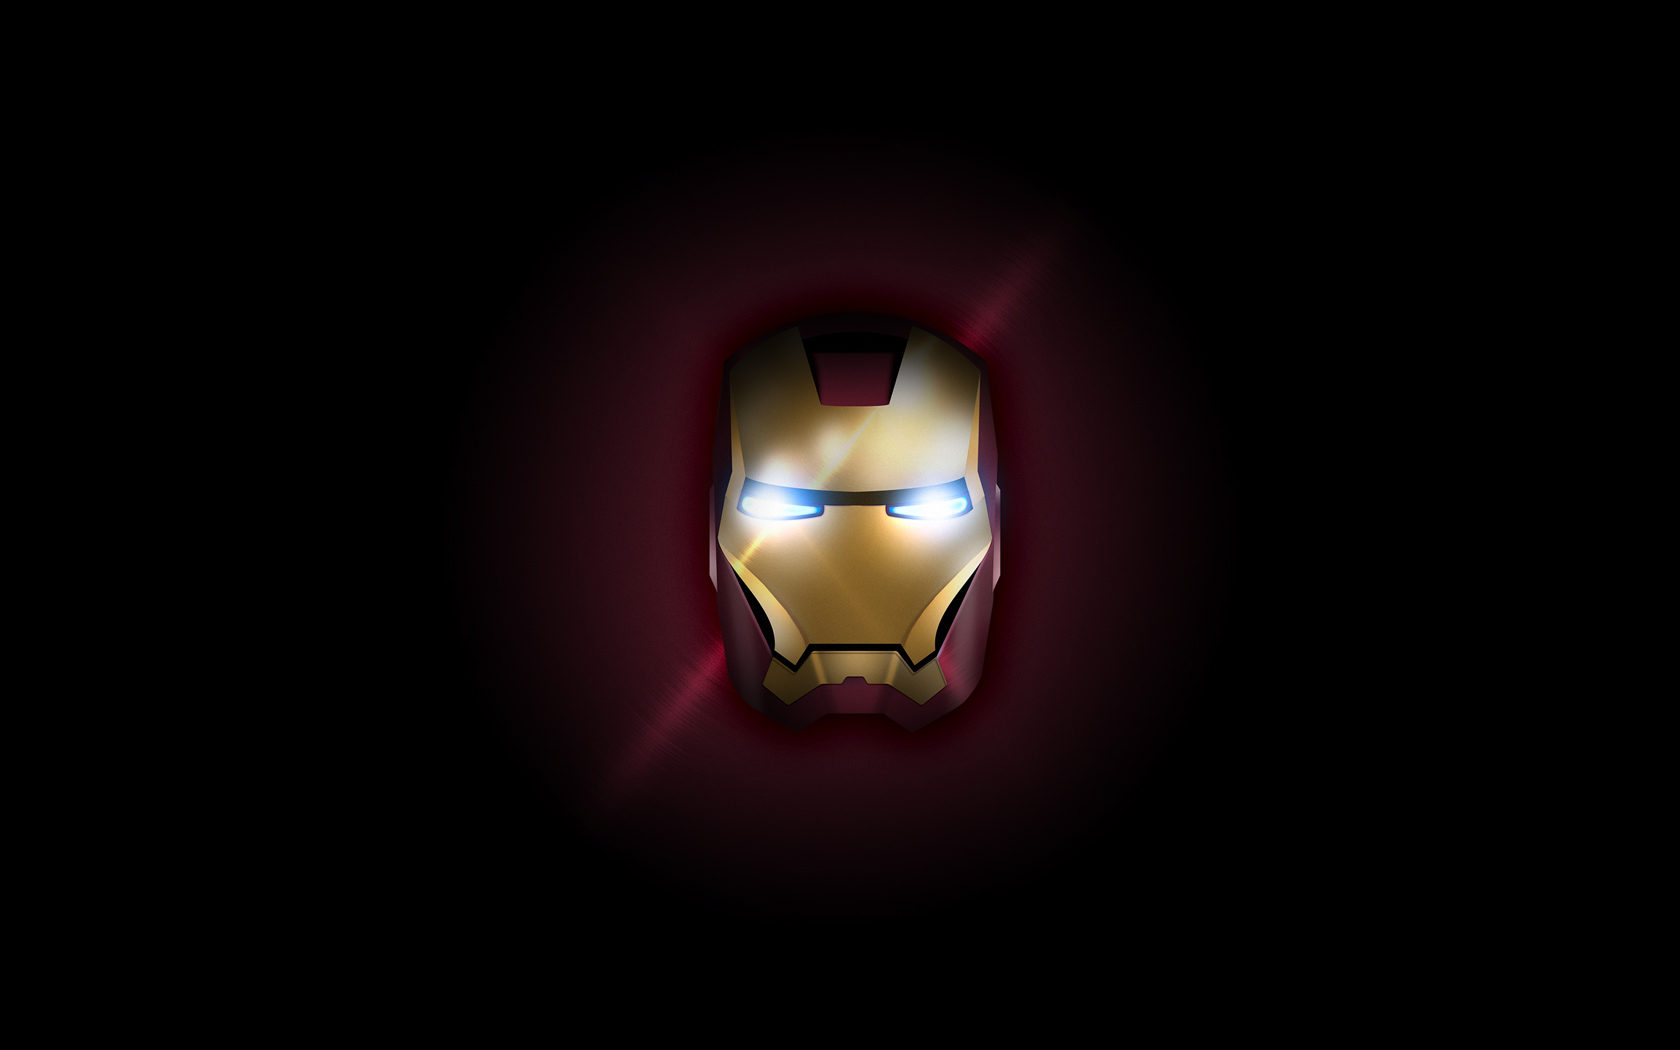 Great Wallpaper Macbook Iron Man - ironman3-ai-ps  HD_416452.jpg